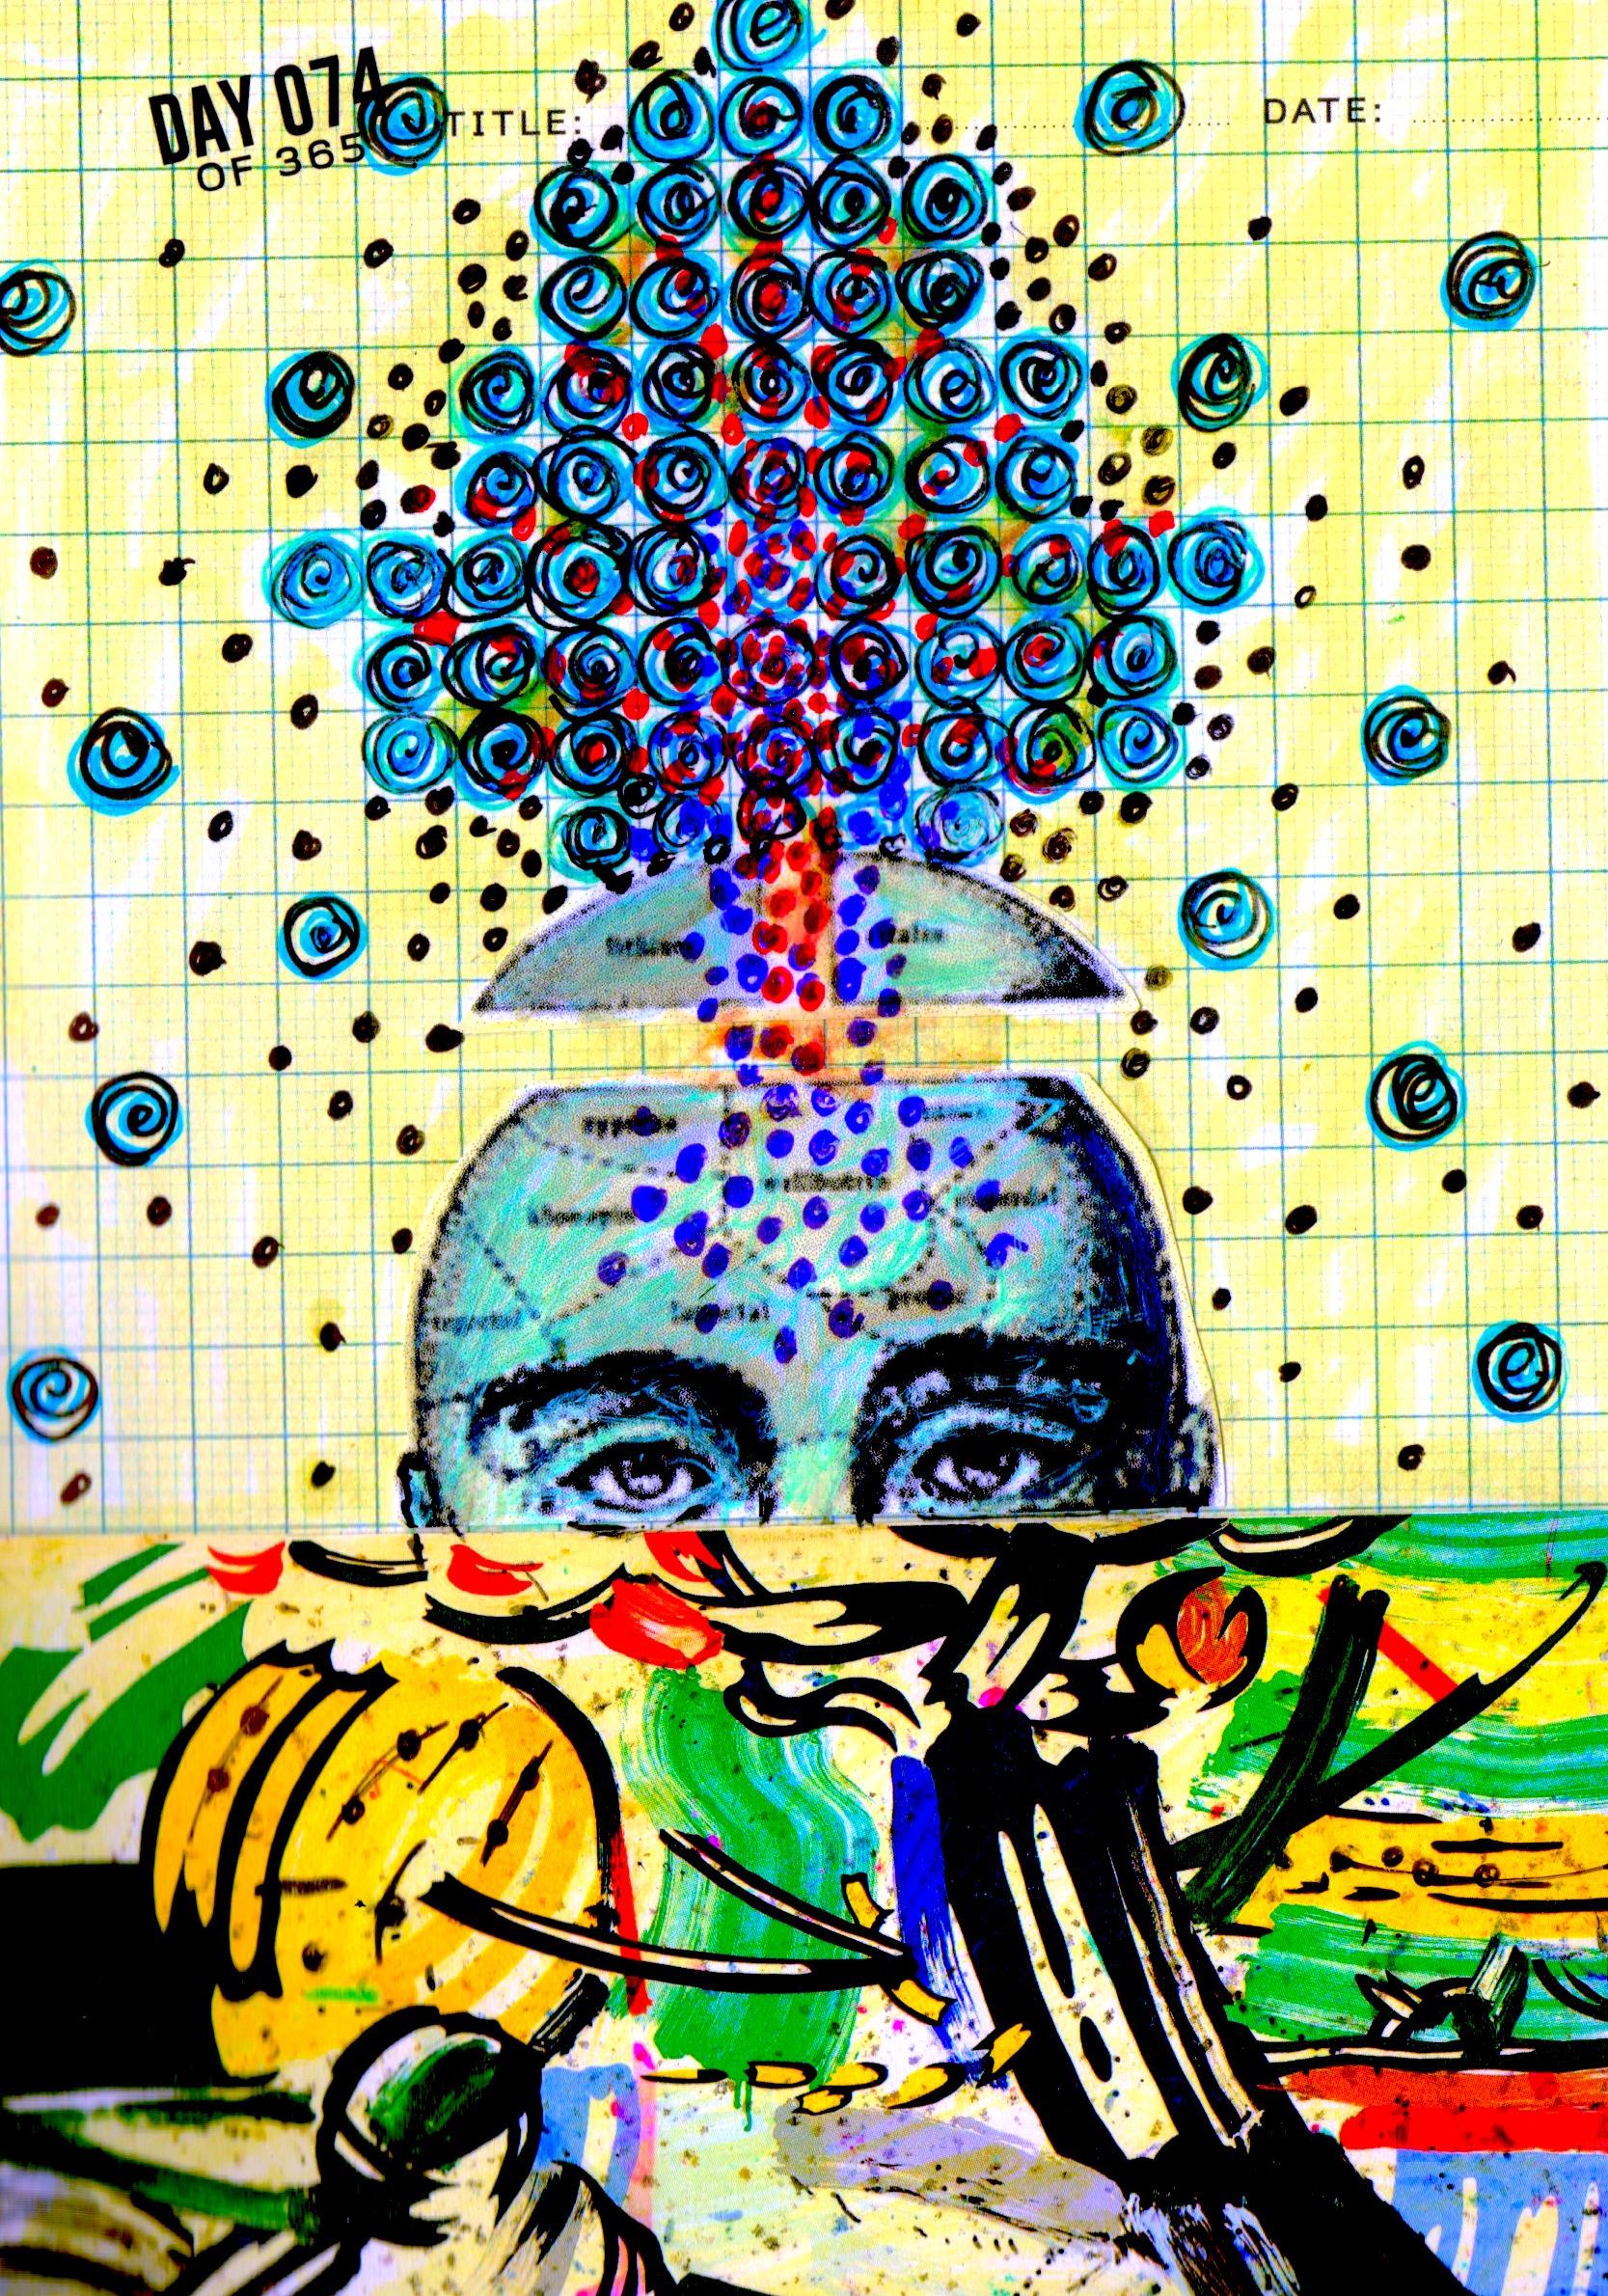 Drawn brain art #6